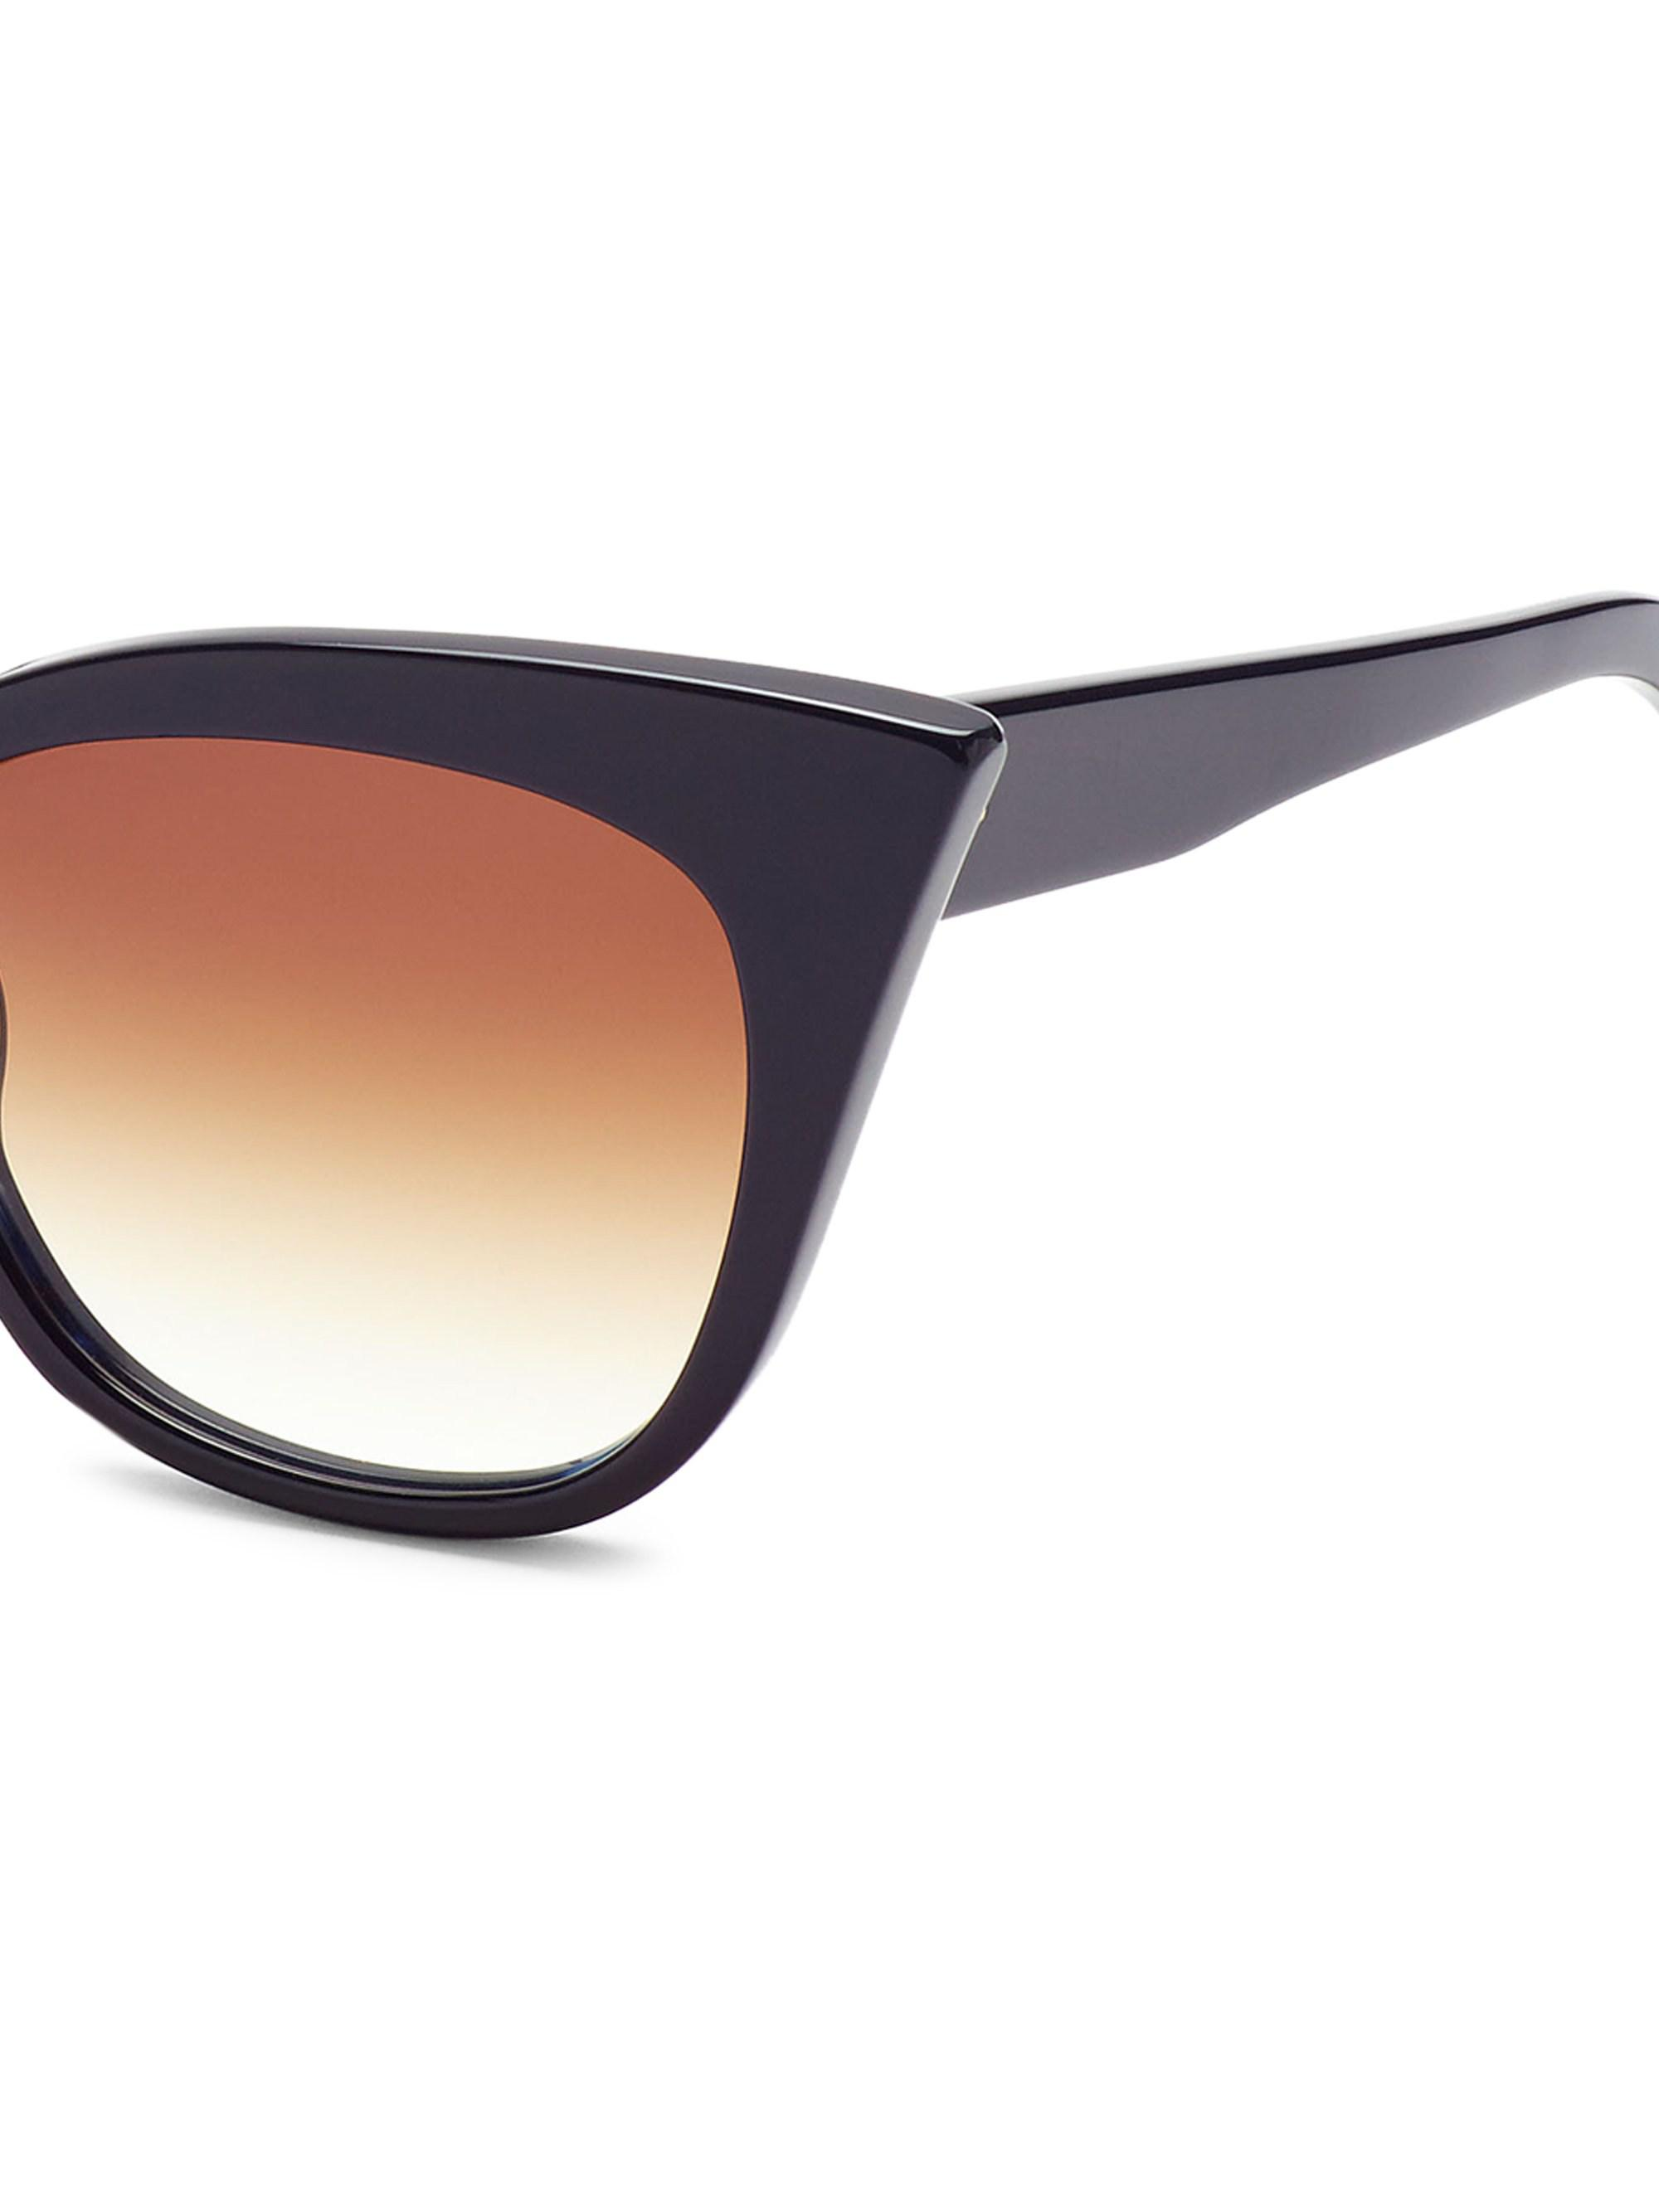 6ee16ae9dac3 Dita Eyewear - Blue Magnifique 56mm Cat-eye Sunglasses - Lyst. View  fullscreen